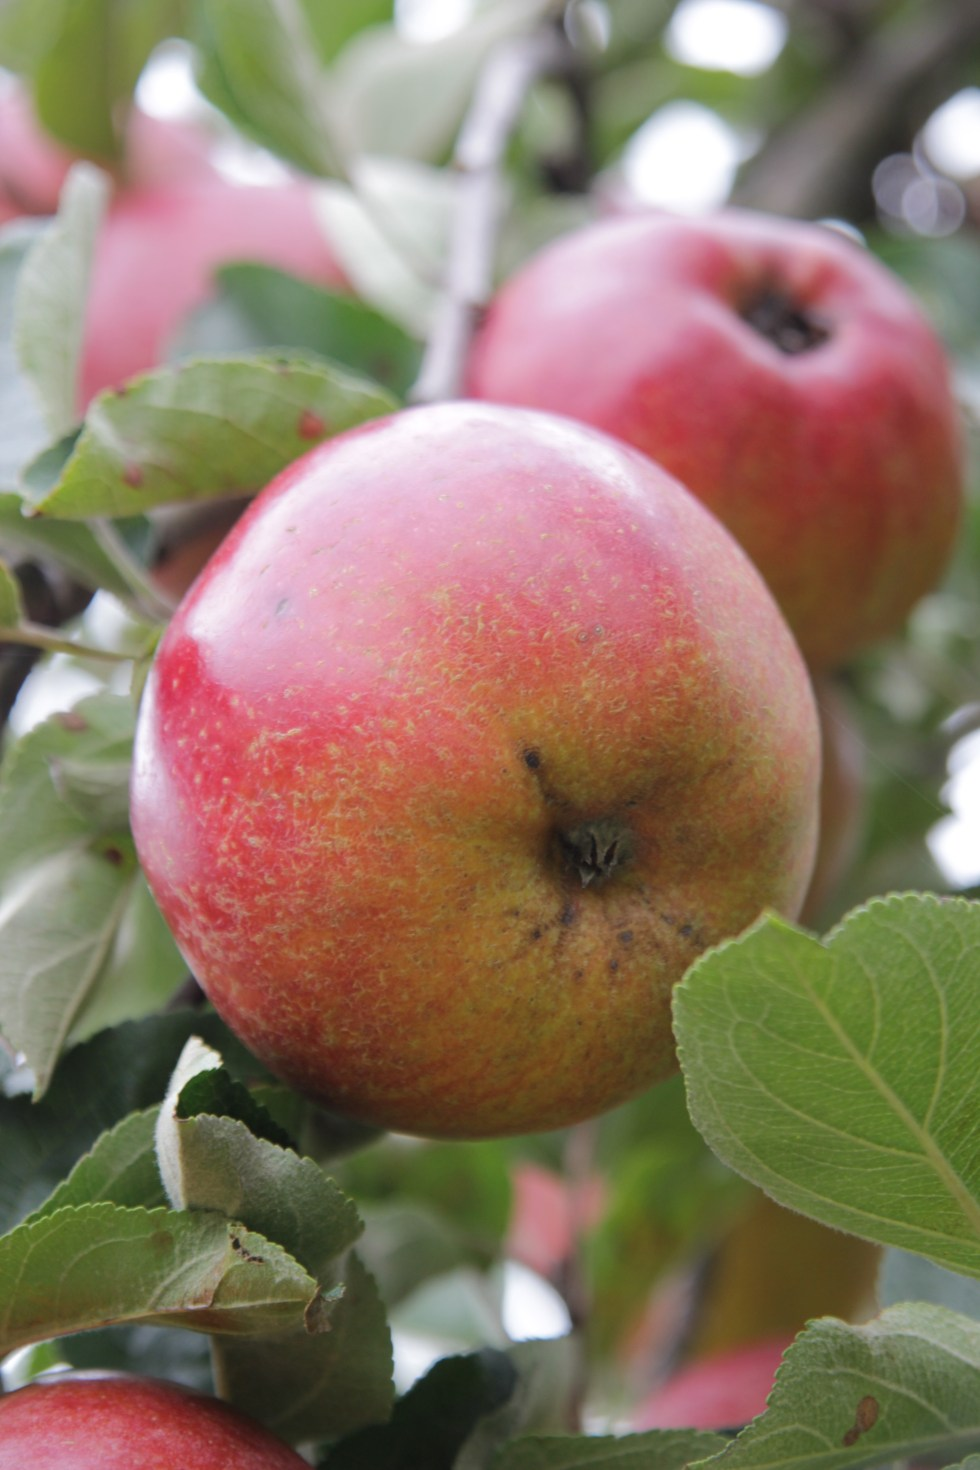 apple william crump 2 National tree week celebrating trees